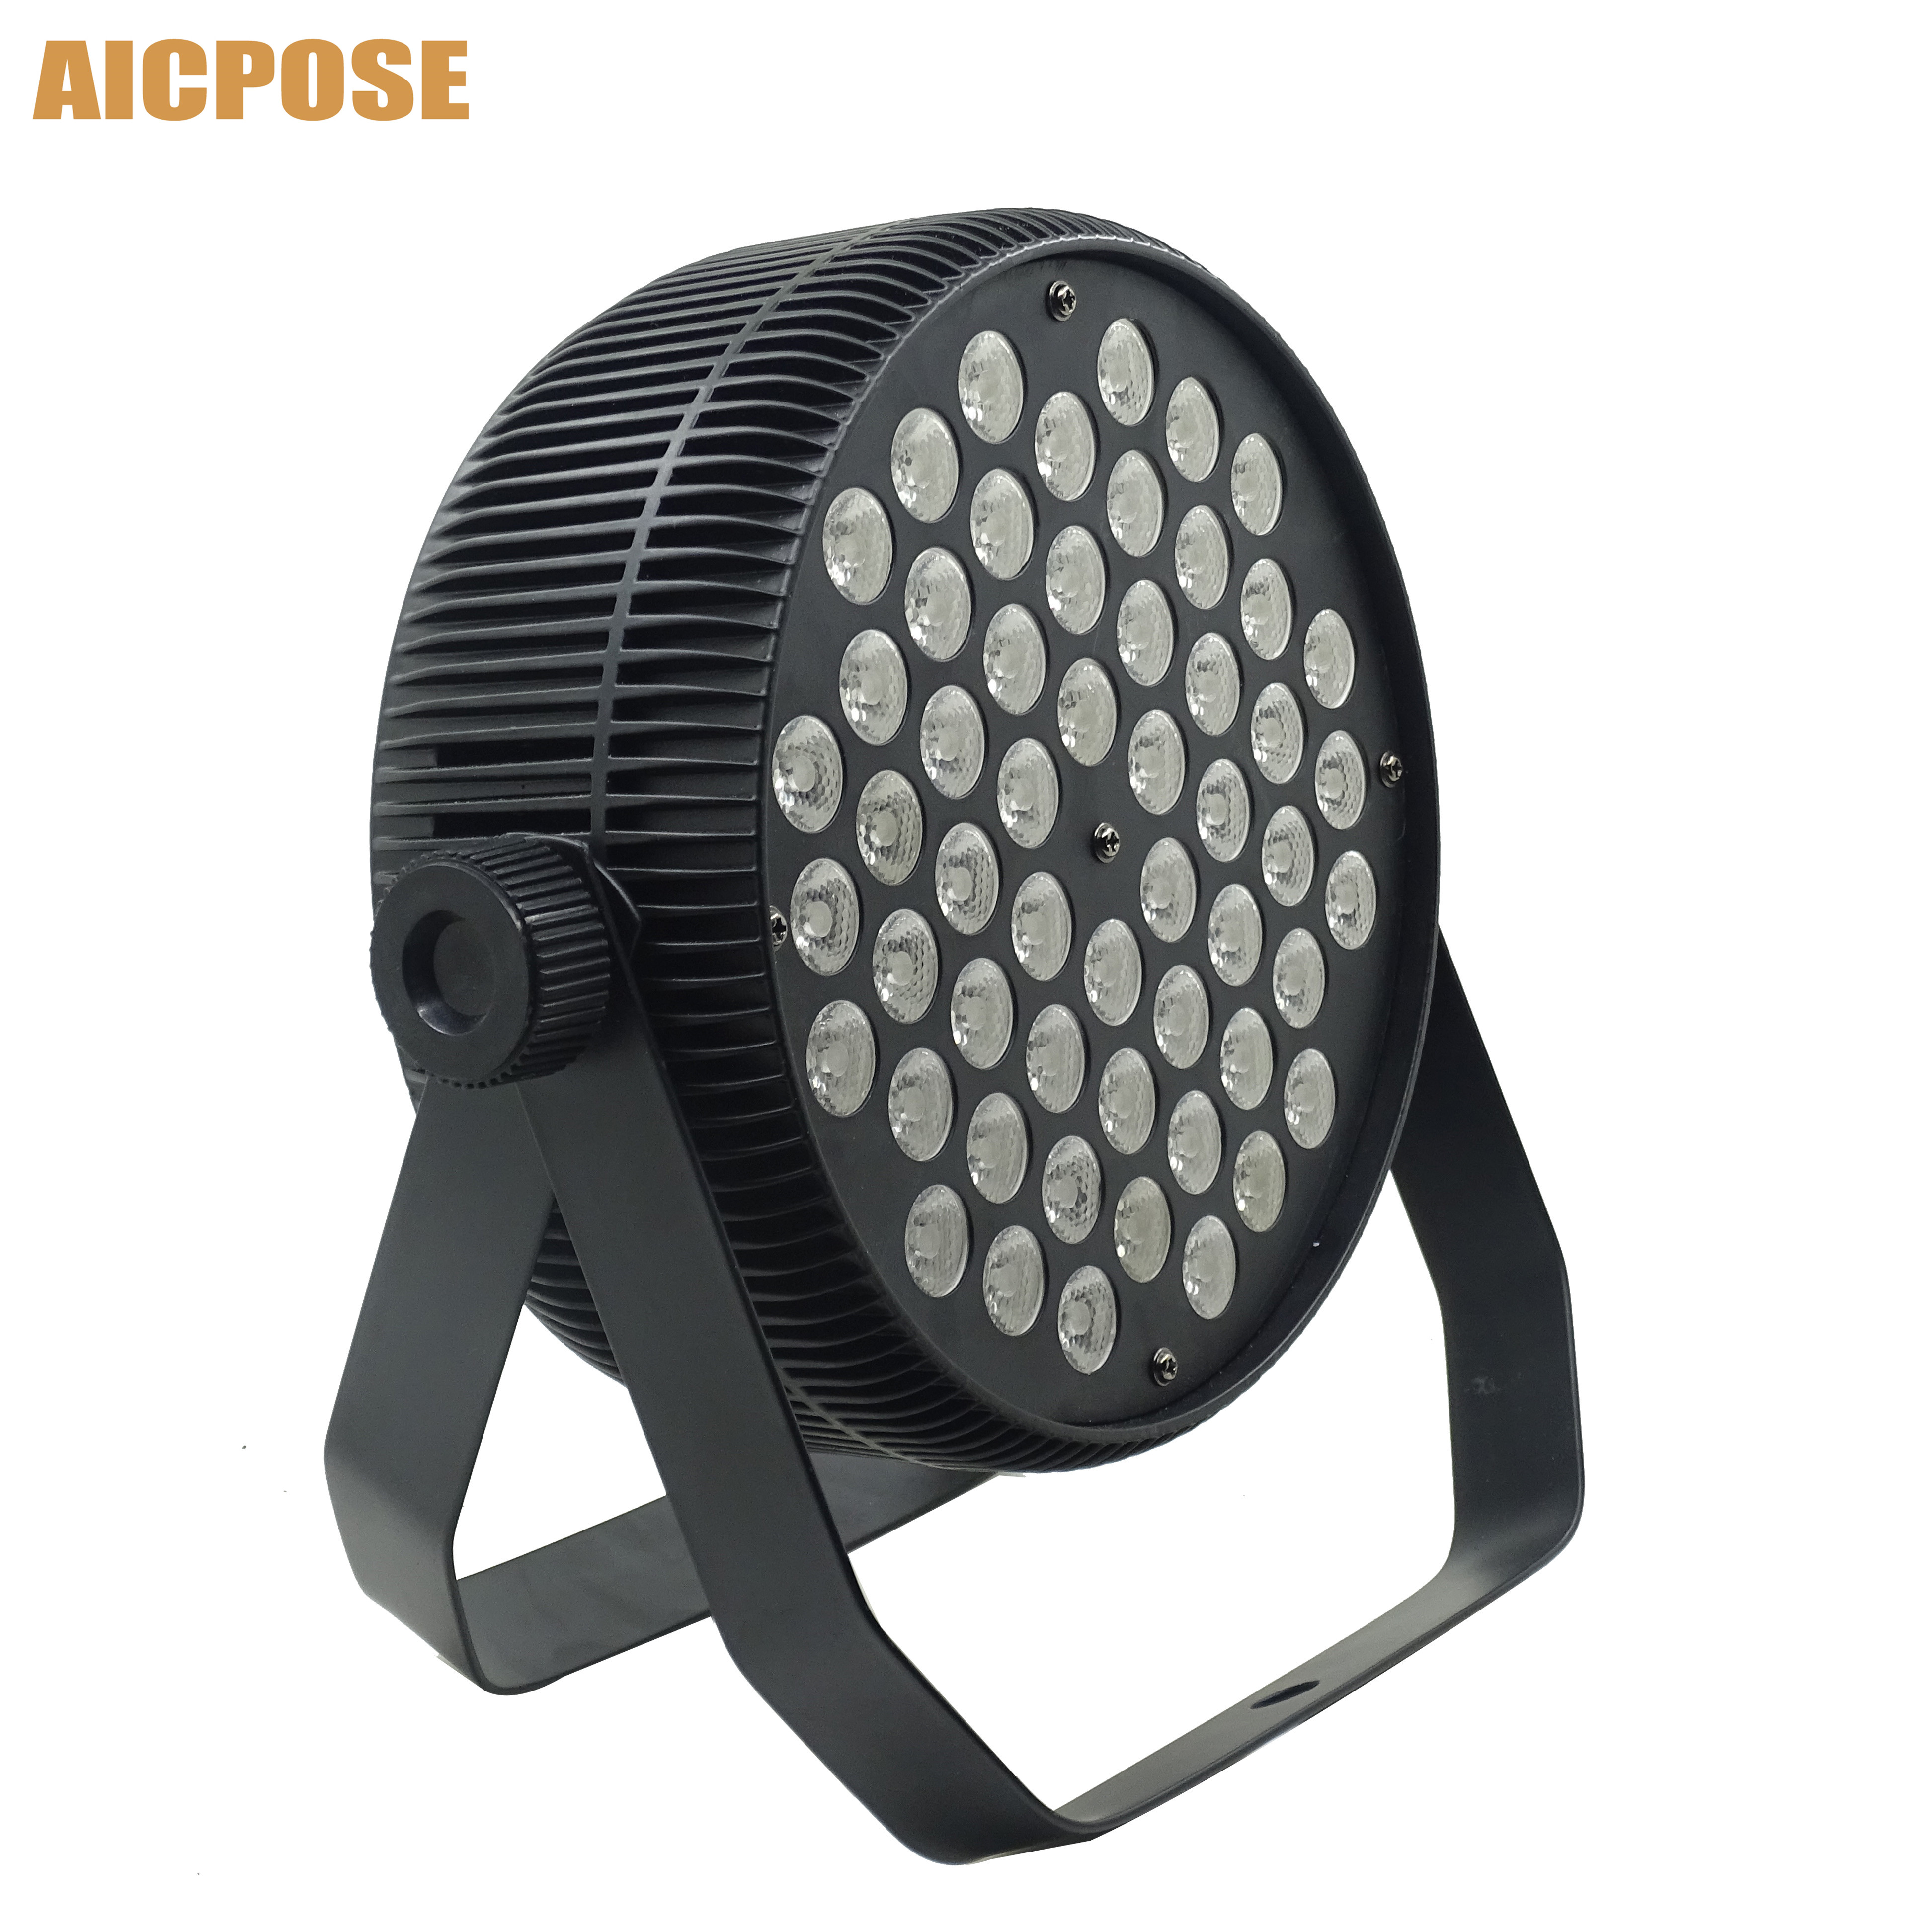 Aluminum Flat LED Par 54x3W RGB 3 in 1 LED Par Can Light spotlight DJ Disco Projector Wall washer stage lighting